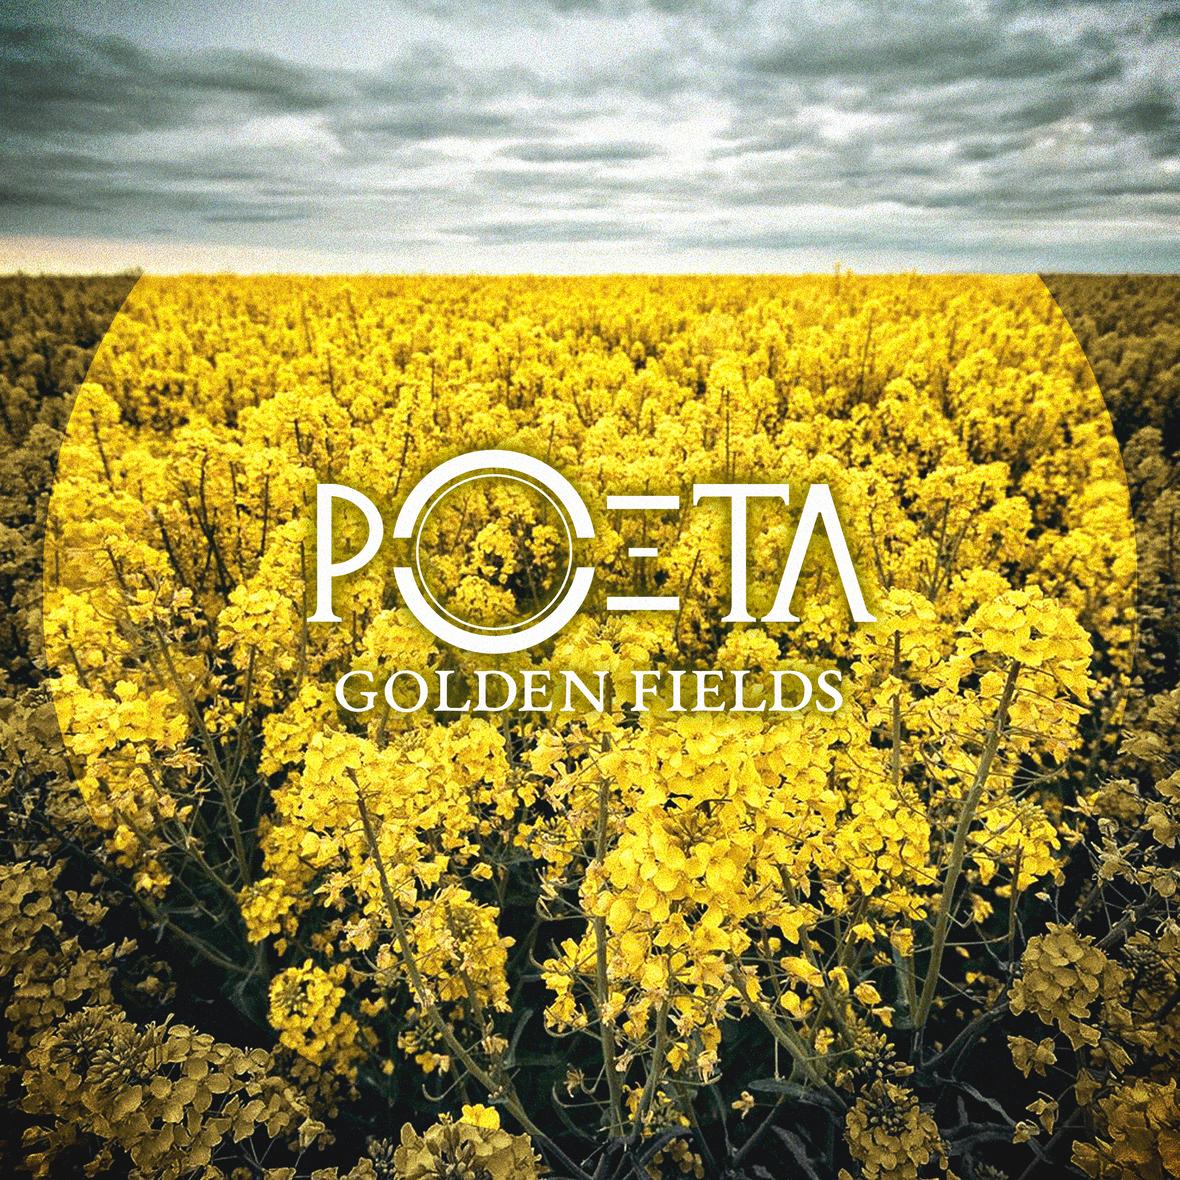 poeta golden fields